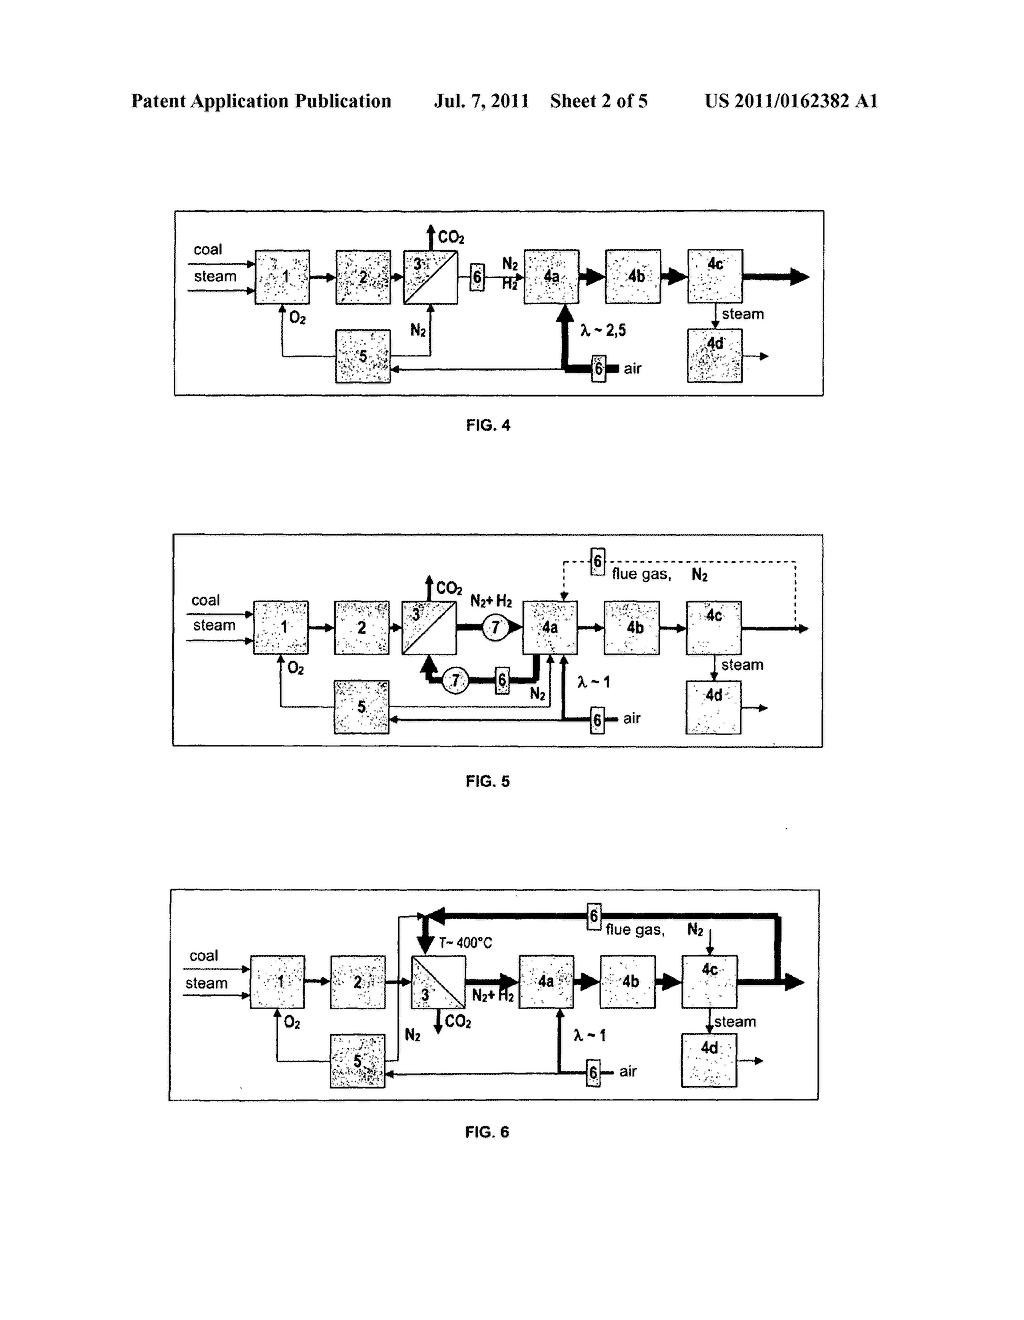 Igcc Power Plant Having Flue Gas Recirculation And Flushing Schematic Diagram Image 03